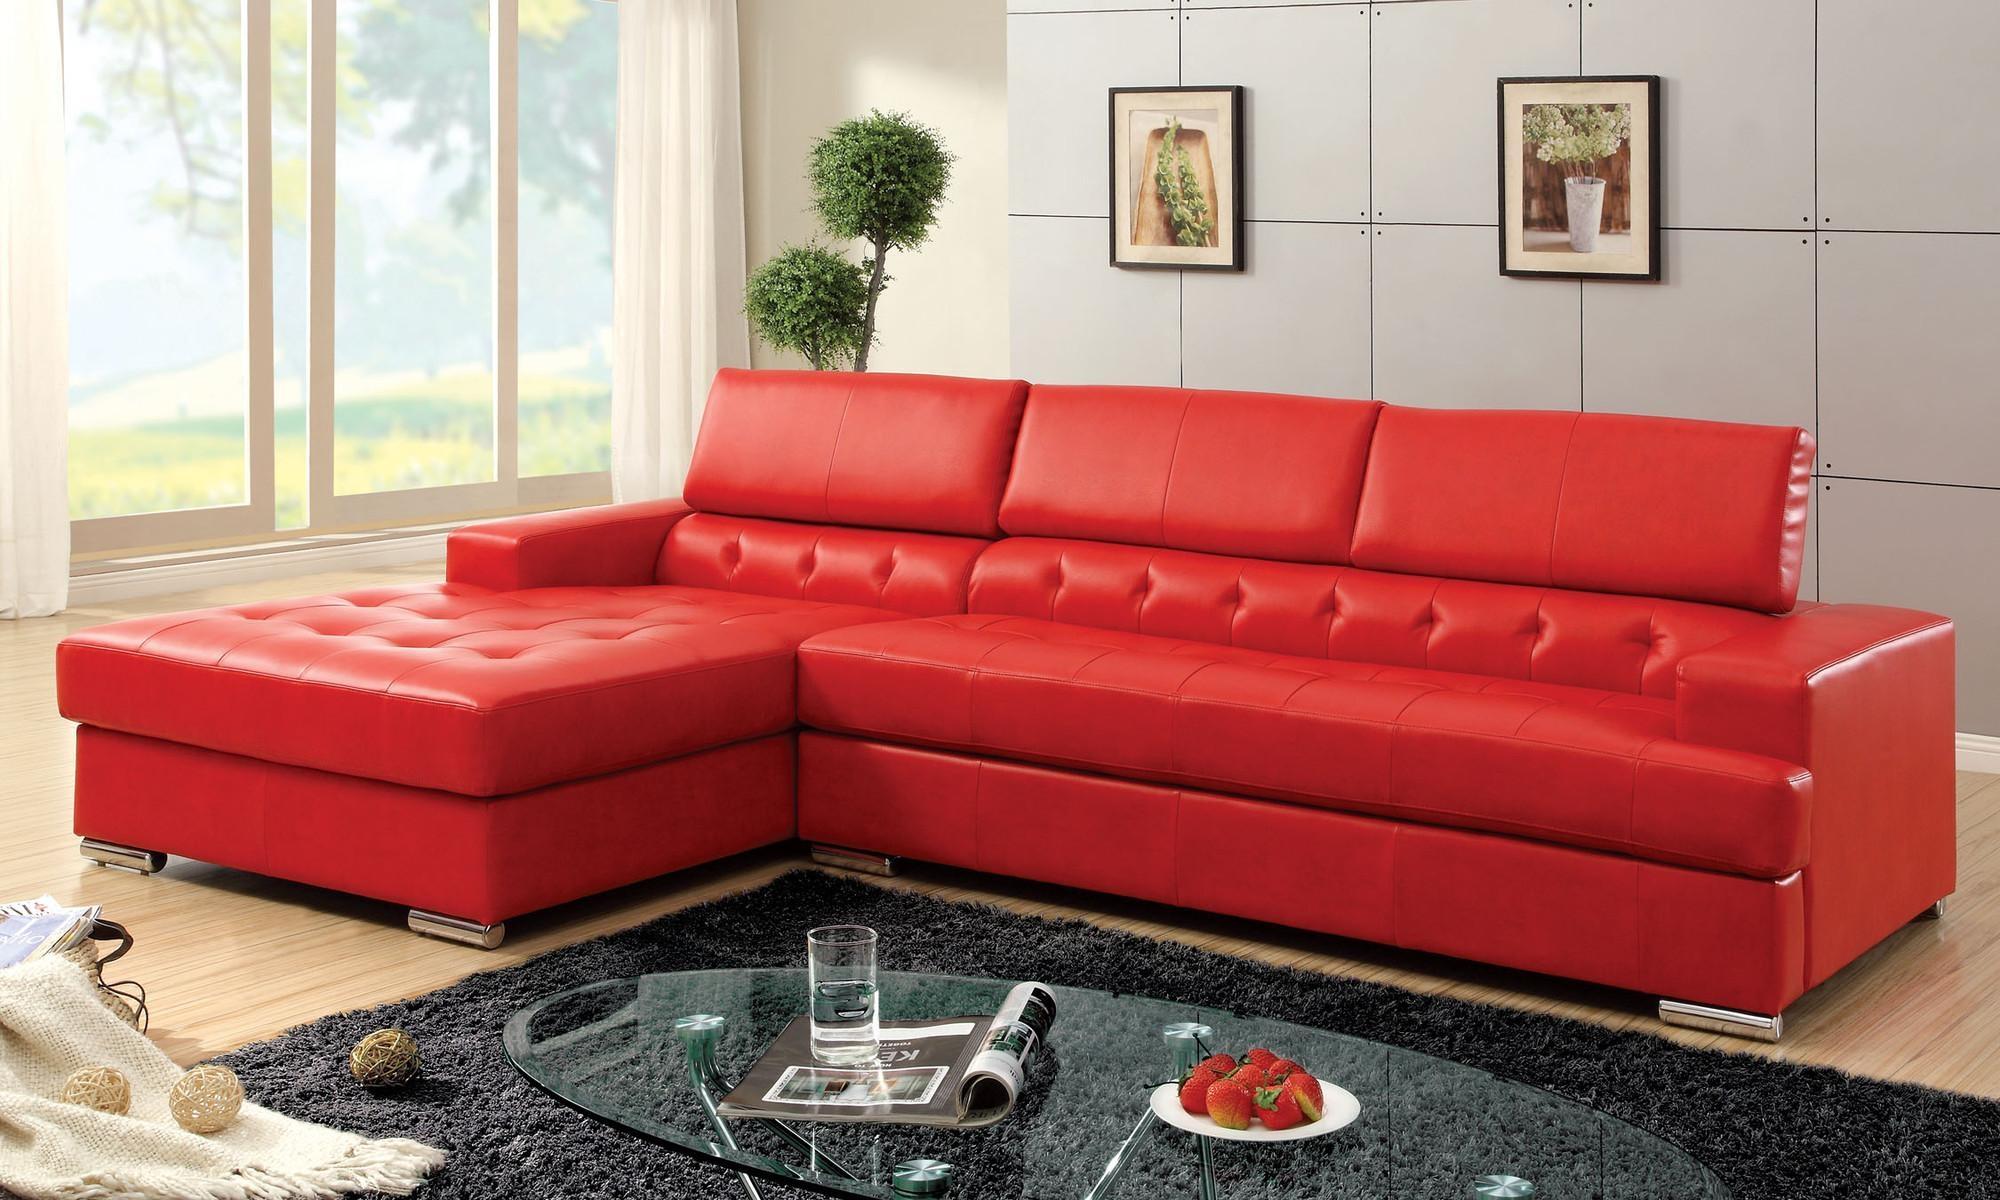 Deep Red Leather Sofa | Tehranmix Decoration Regarding Dark Red Leather Sofas (Image 10 of 20)